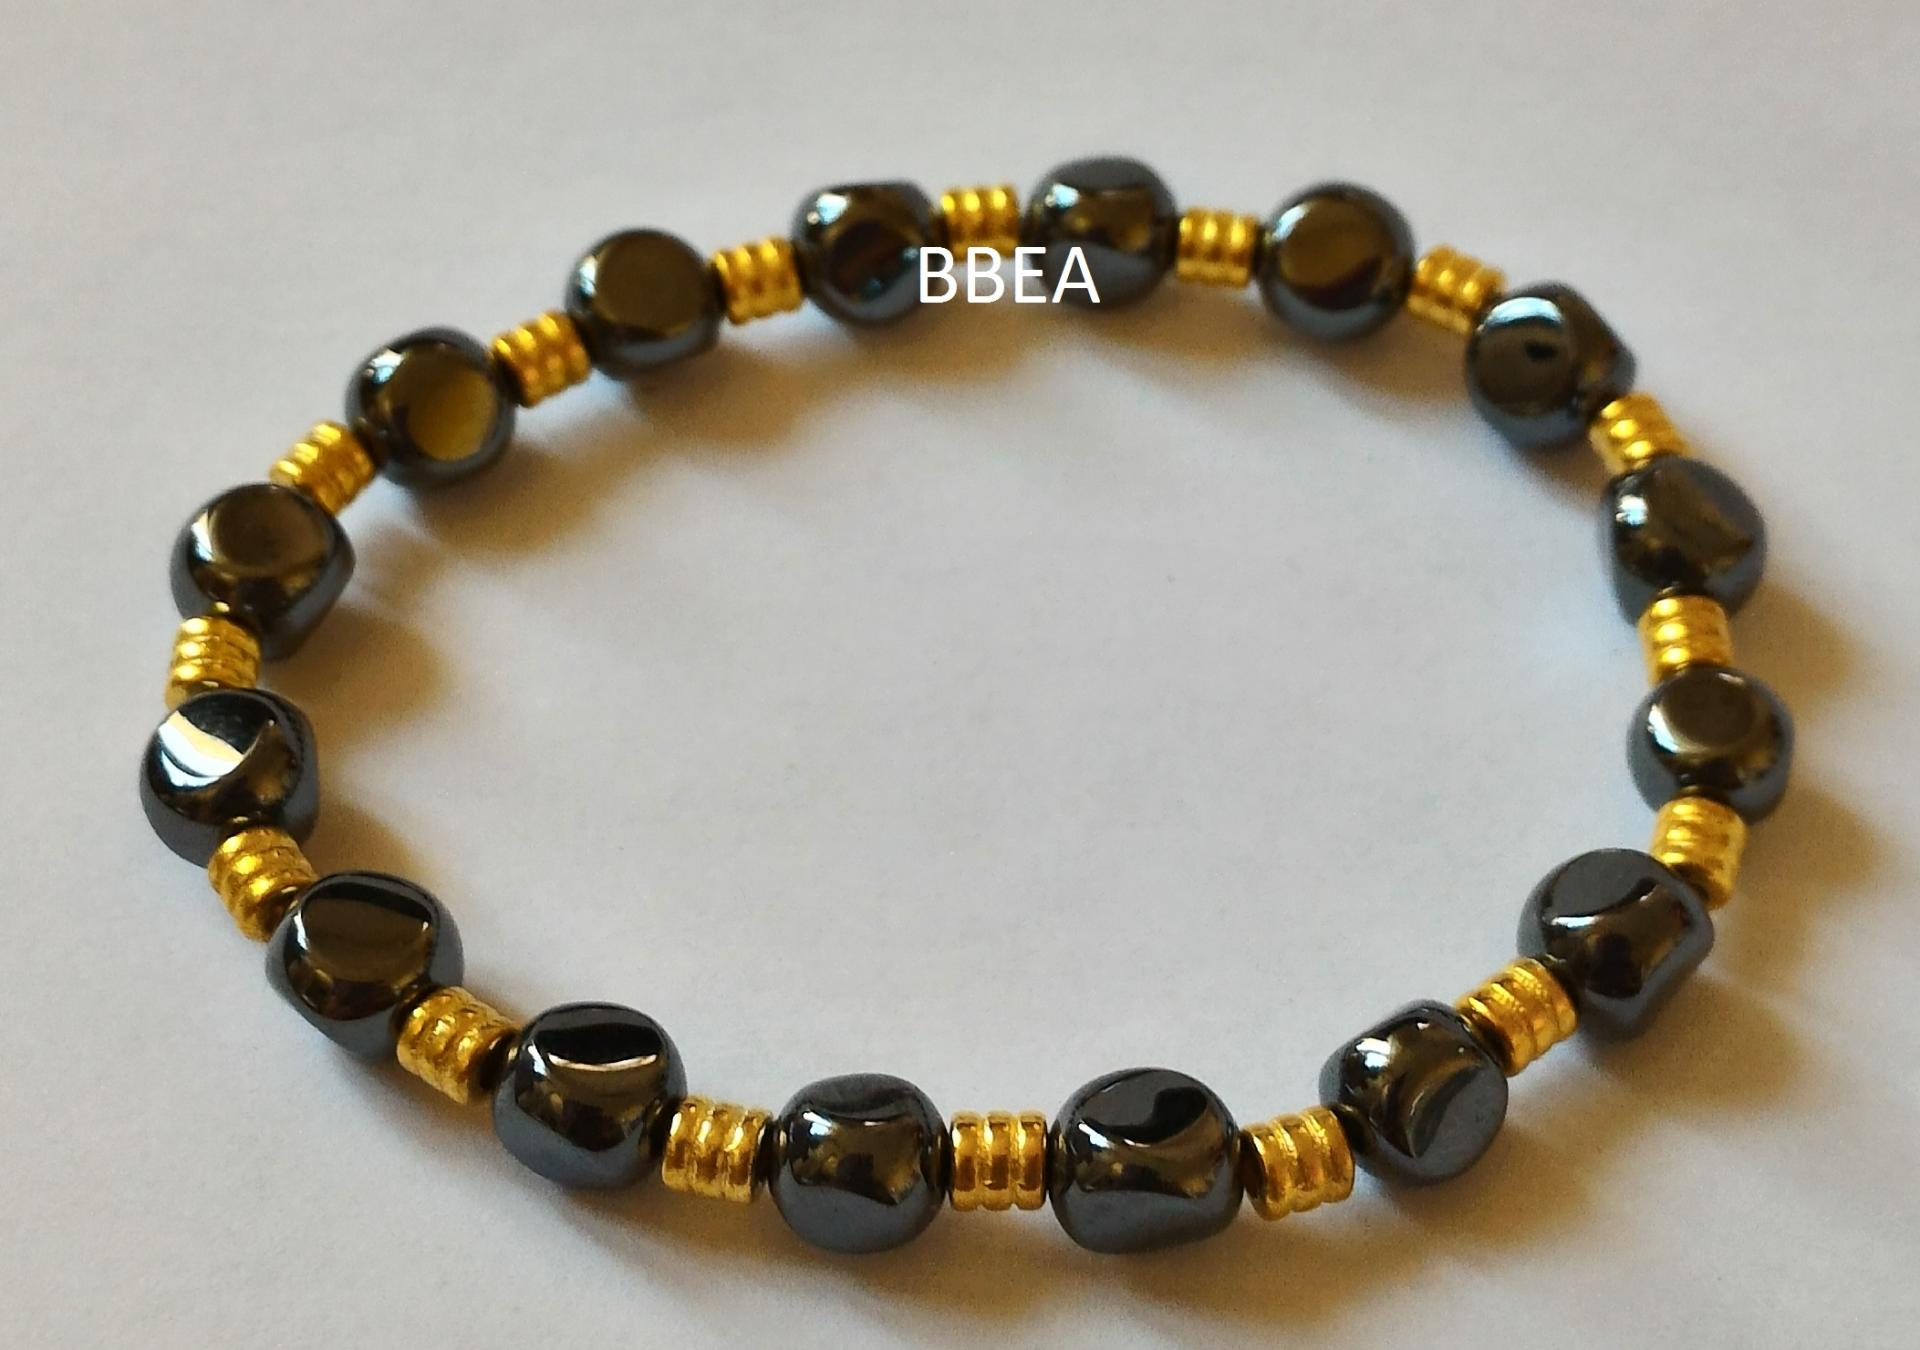 Bracelet hematite 1 1